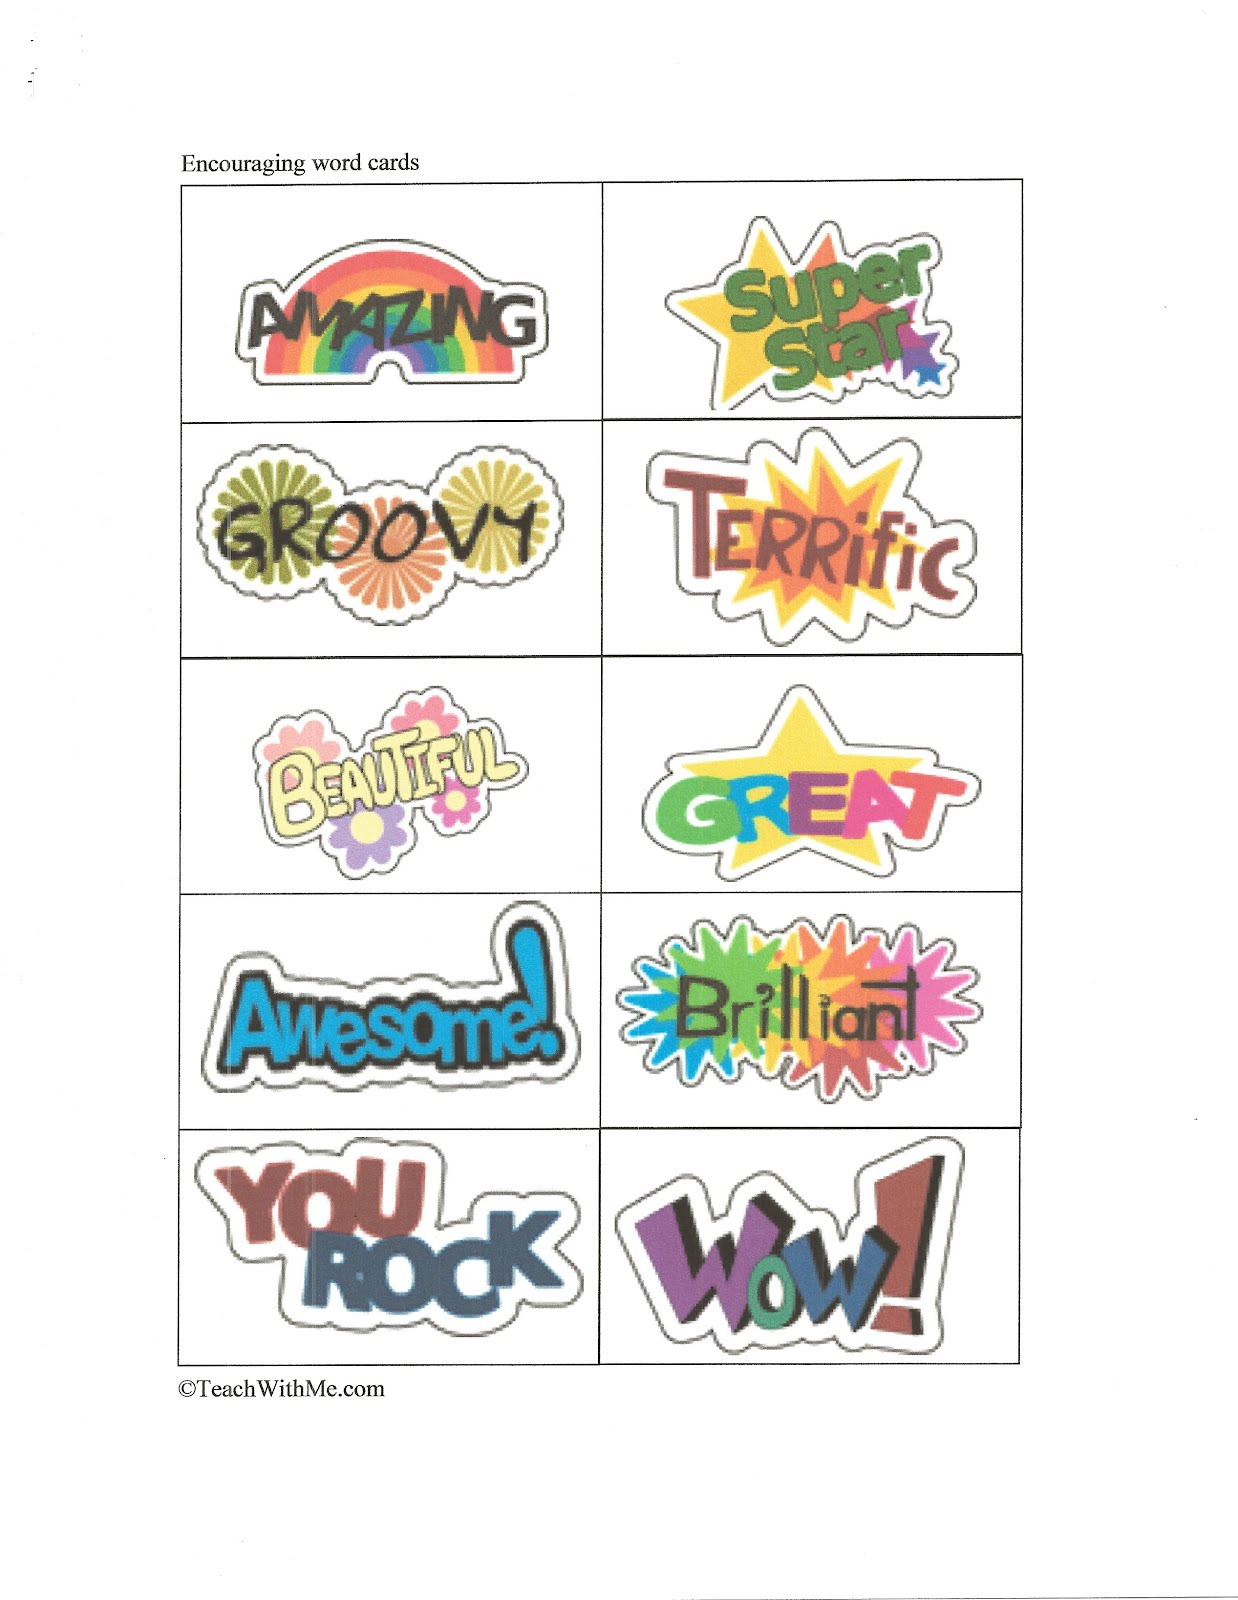 Test of Encouragement Cards for Kids